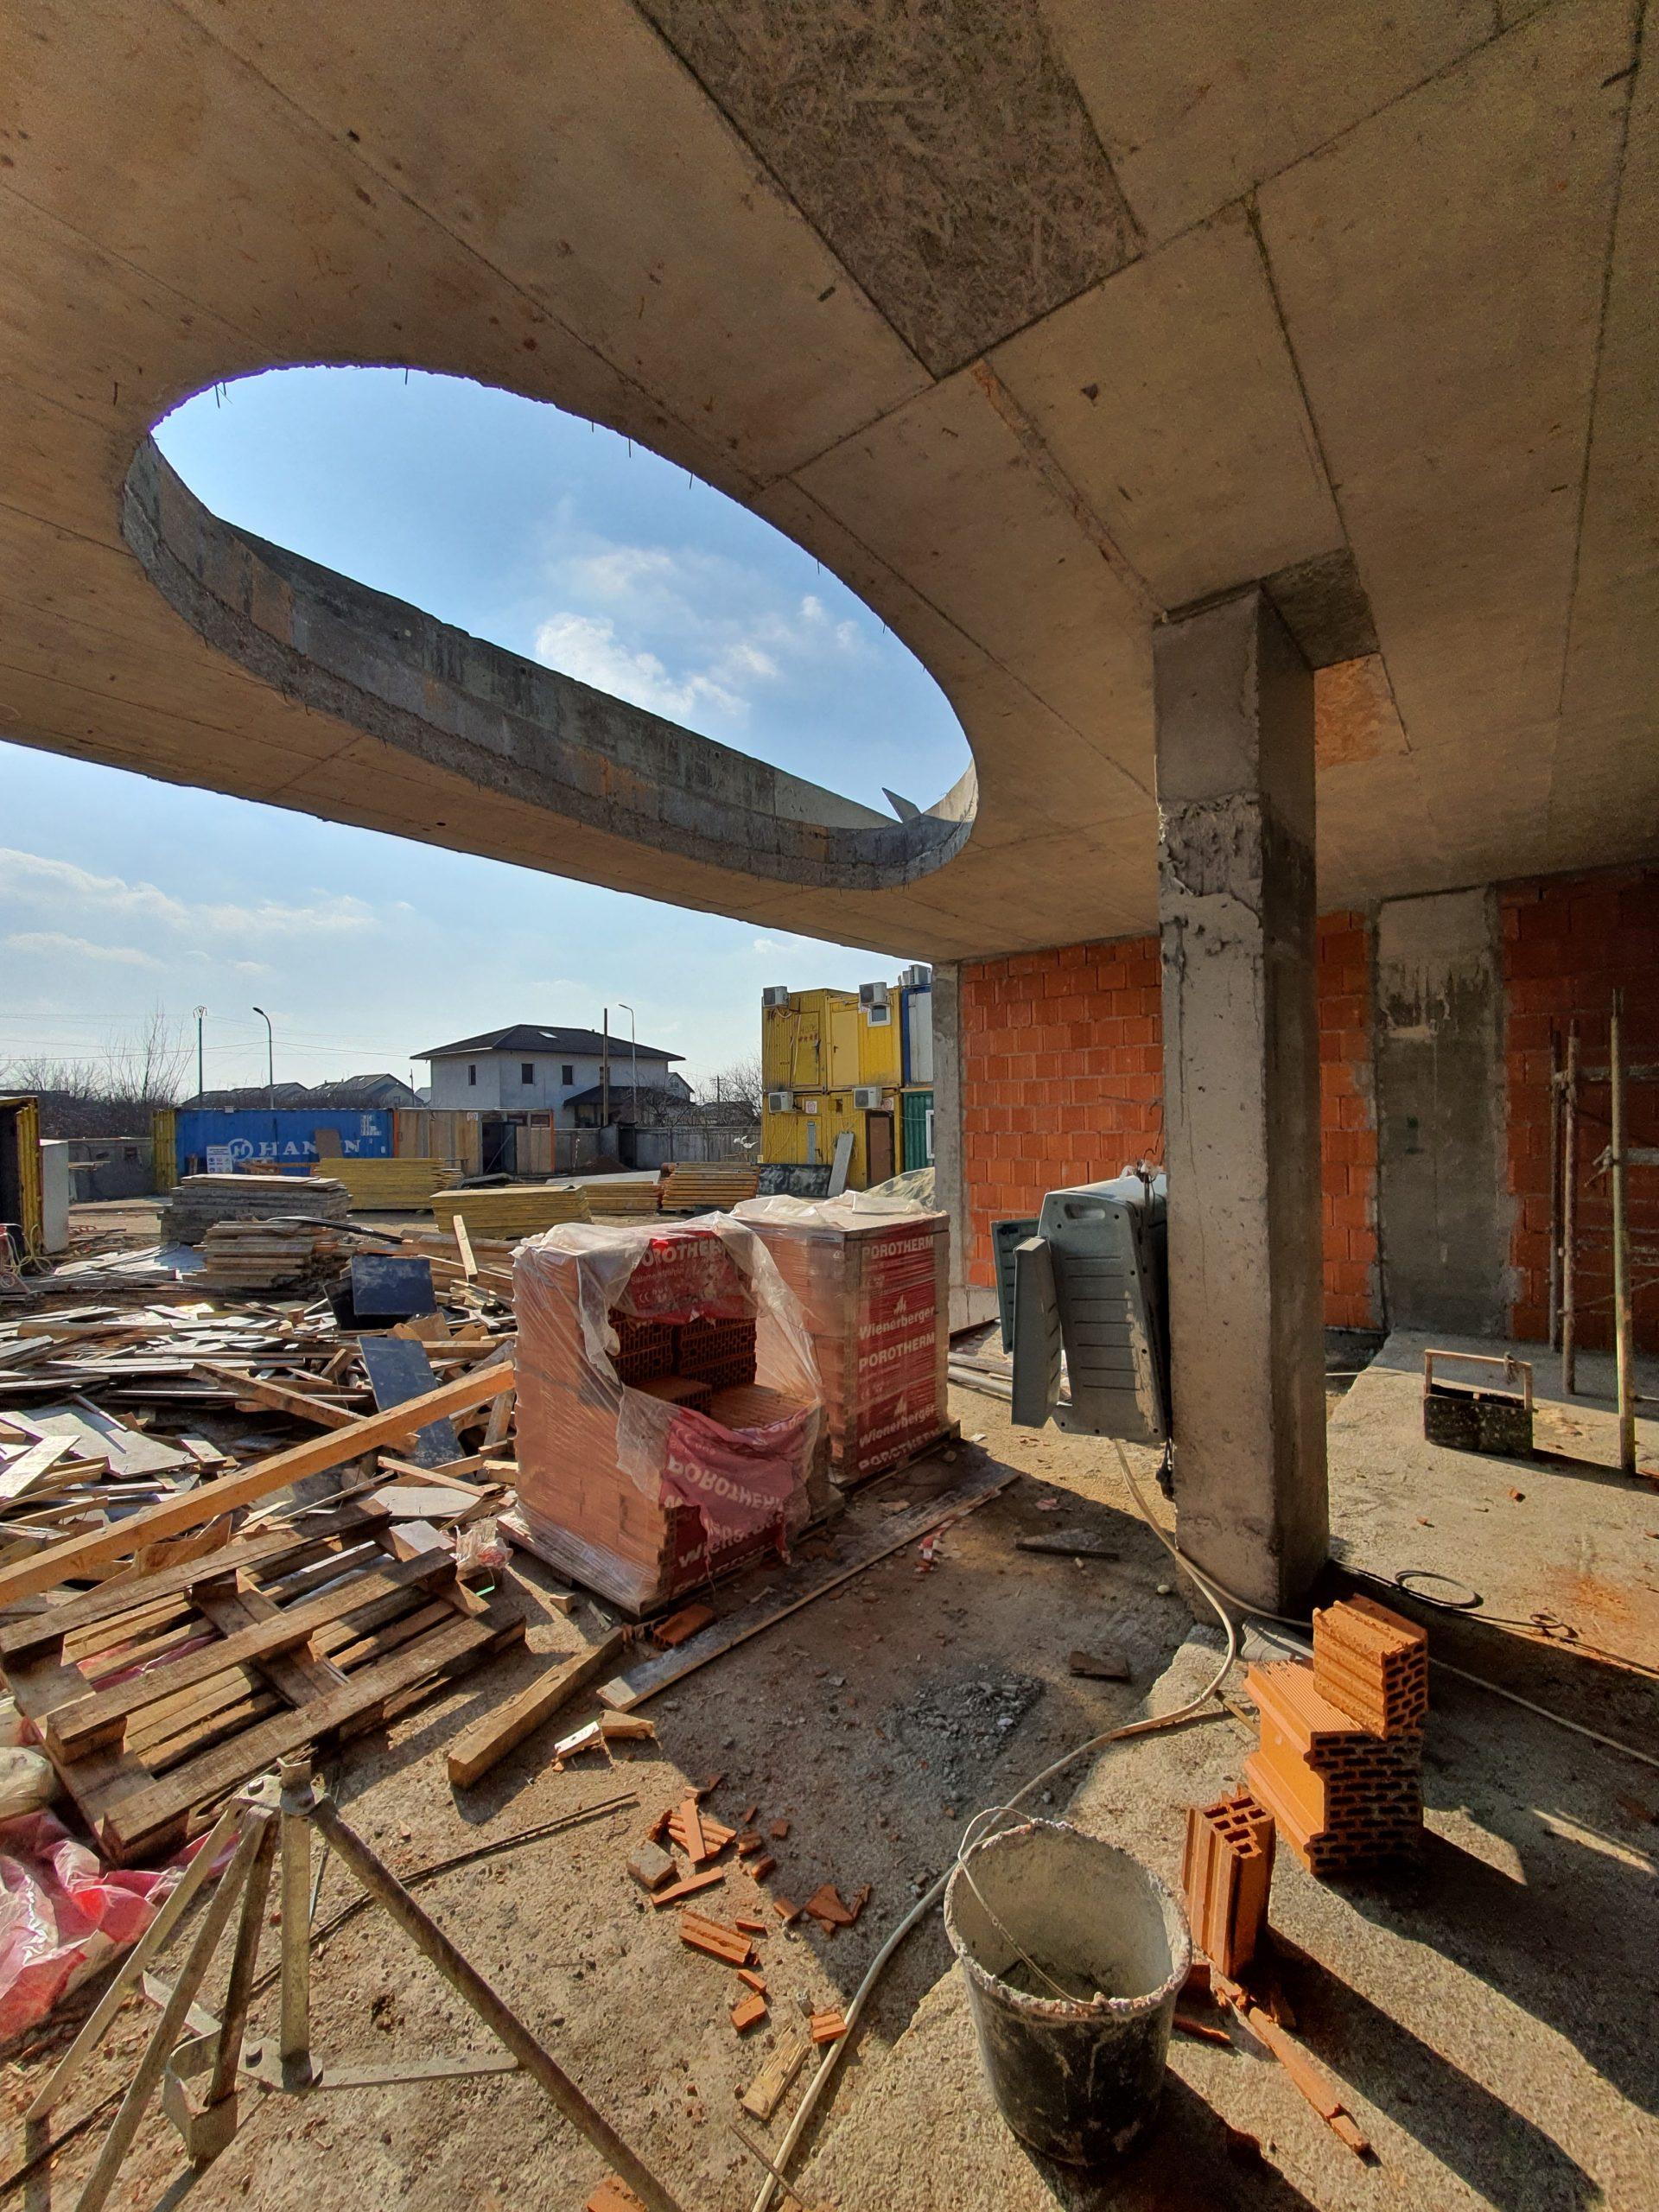 https://nbc-arhitect.ro/wp-content/uploads/2020/10/NBC-Arhitect-_-residences-_-Mogo-Villa-_-Romania-_-in-progress_3-scaled.jpg